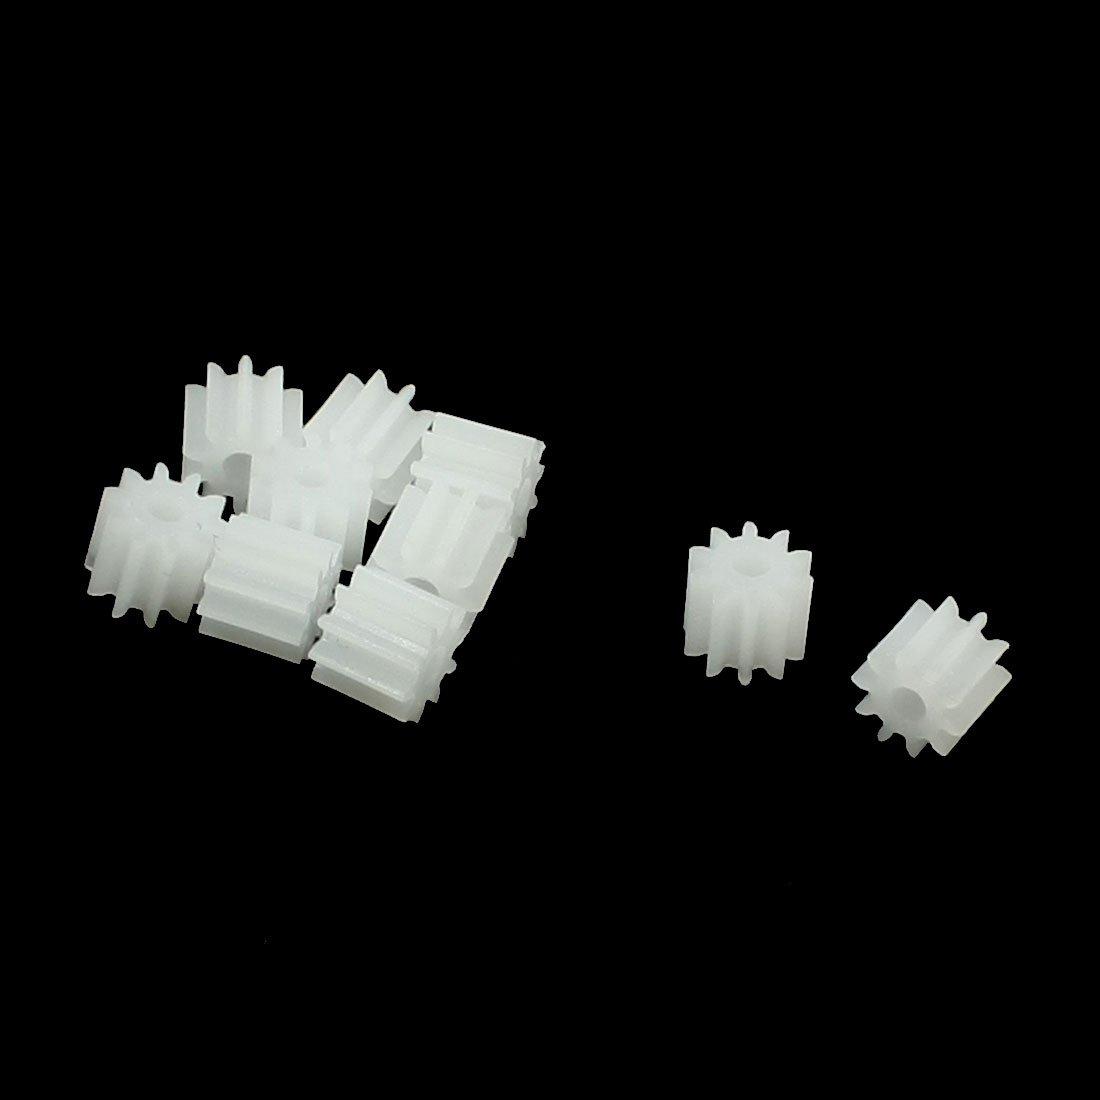 10 Pcs White Plastic 10 Teeth Electrical Models